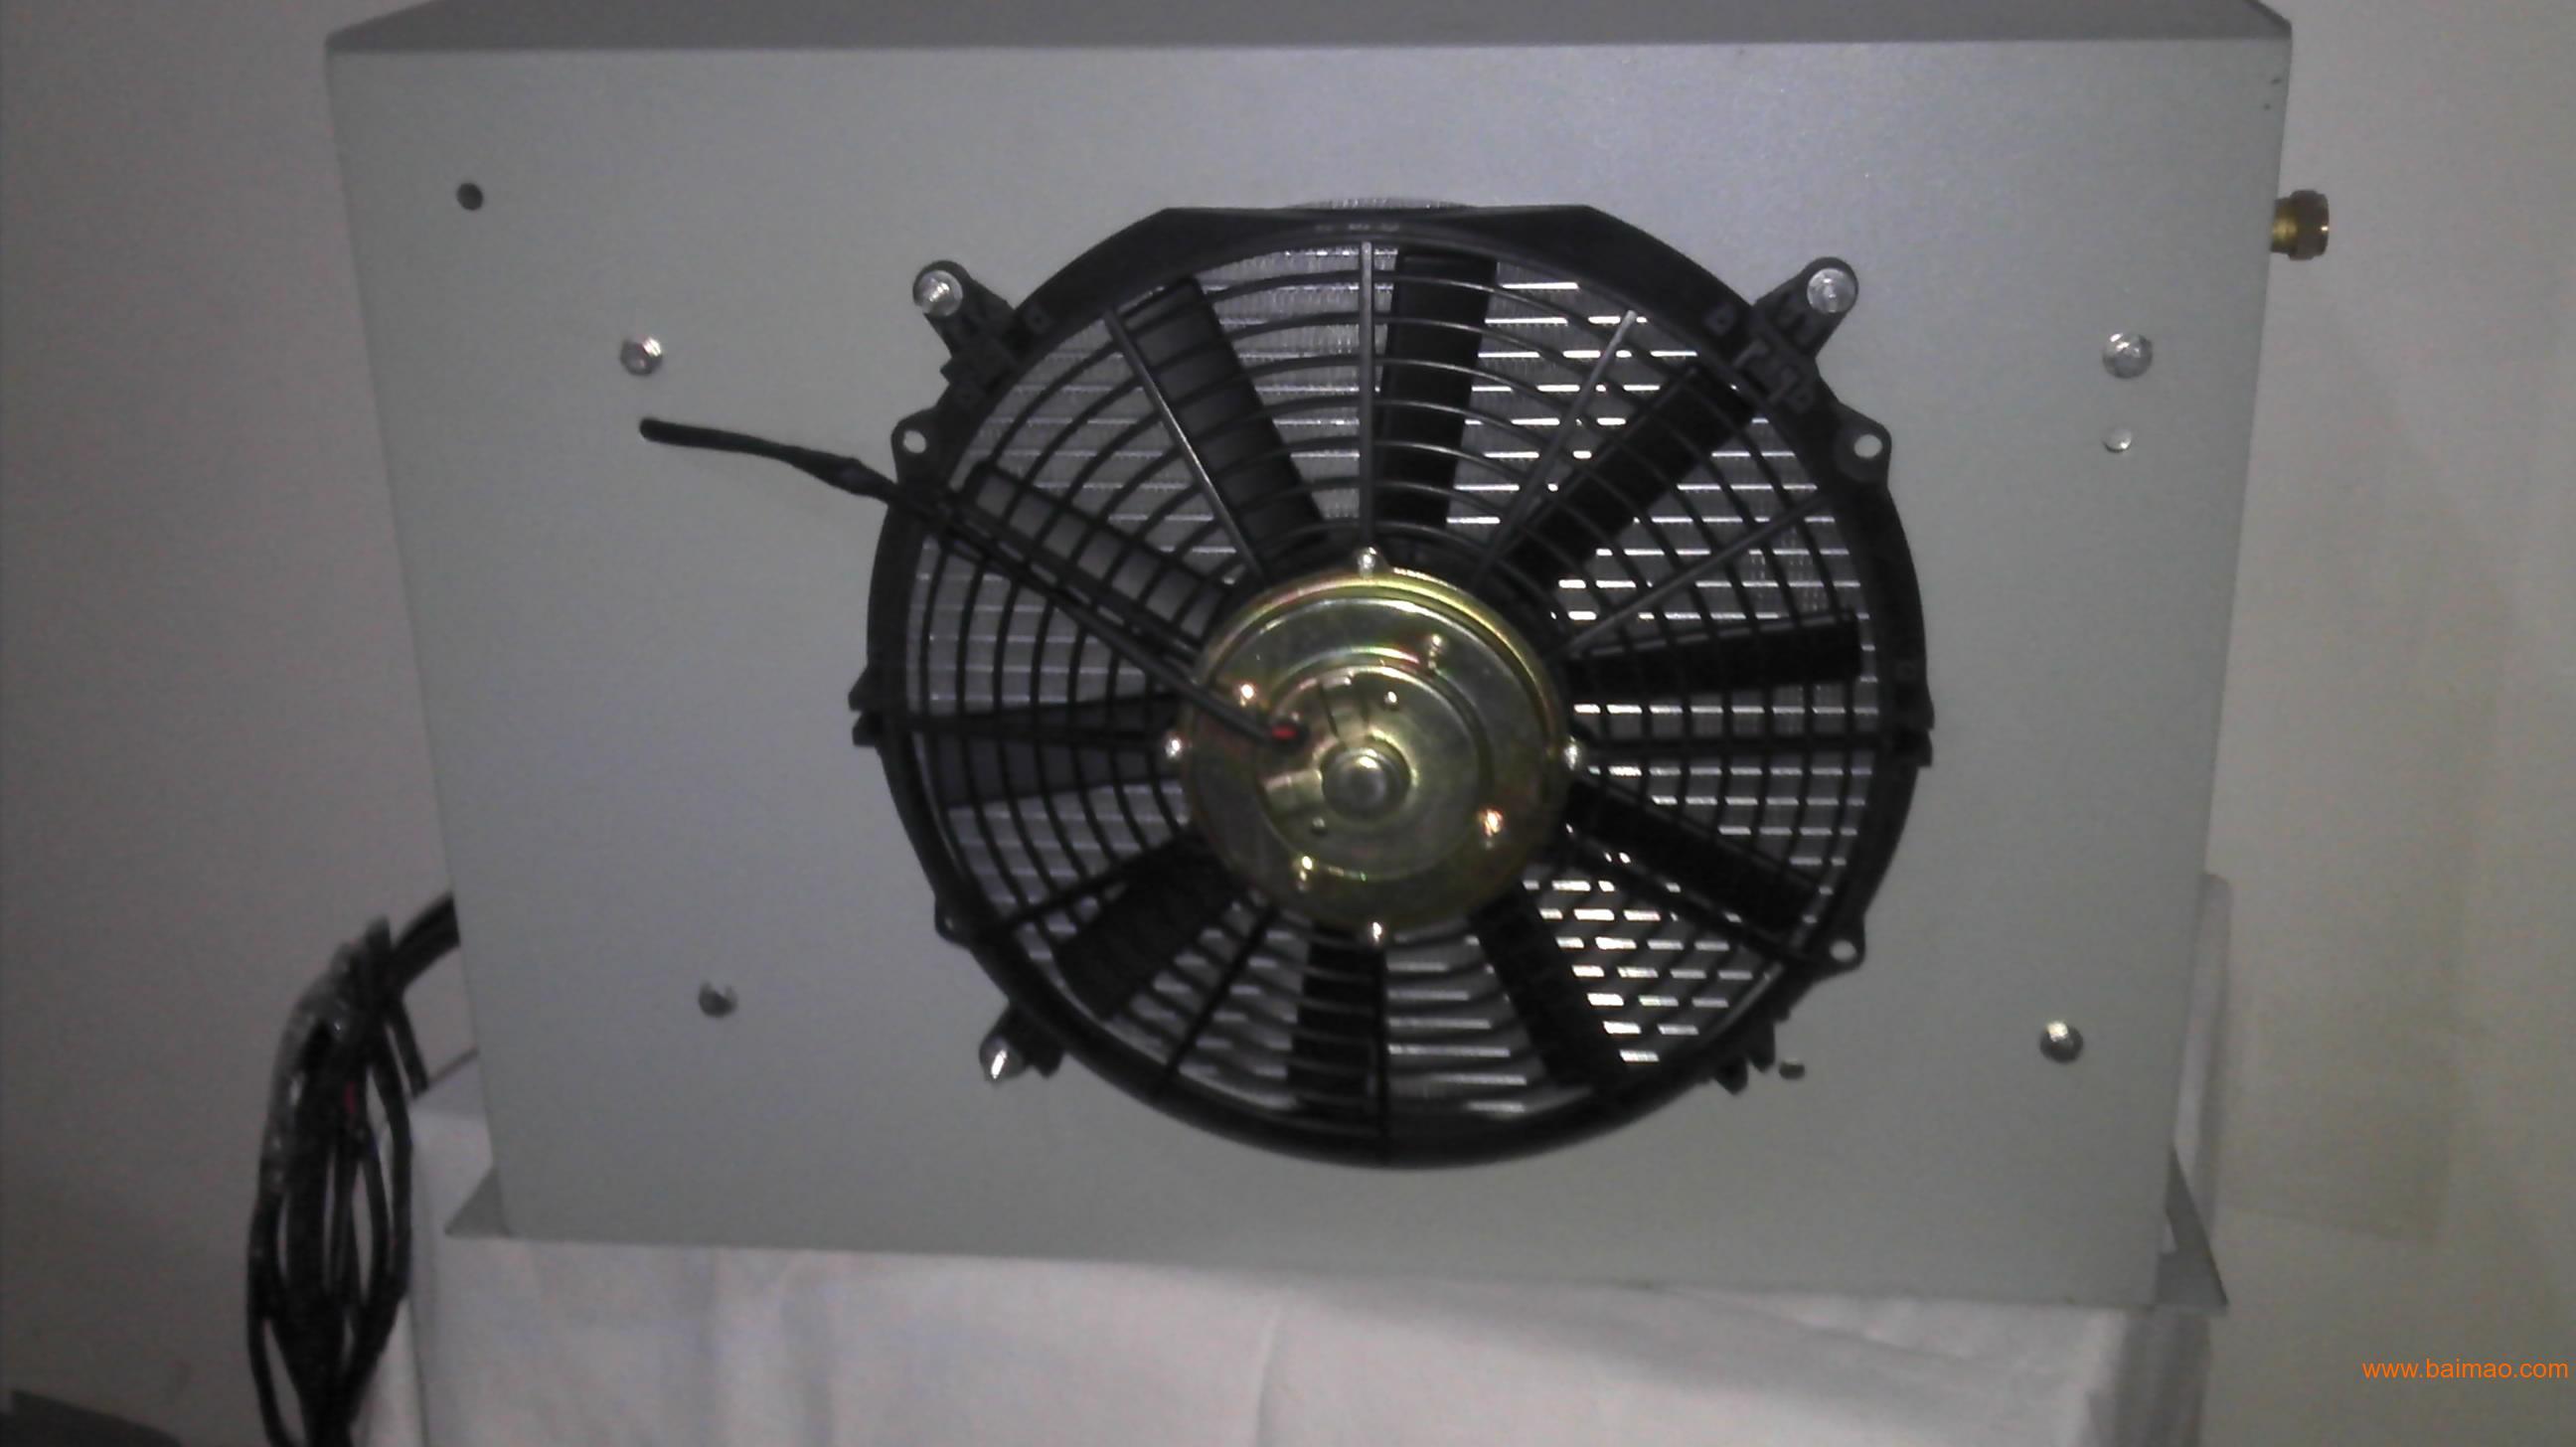 24v卡车直流电动空调,24v卡车直流电动空调生产厂家,24v卡车直流图片